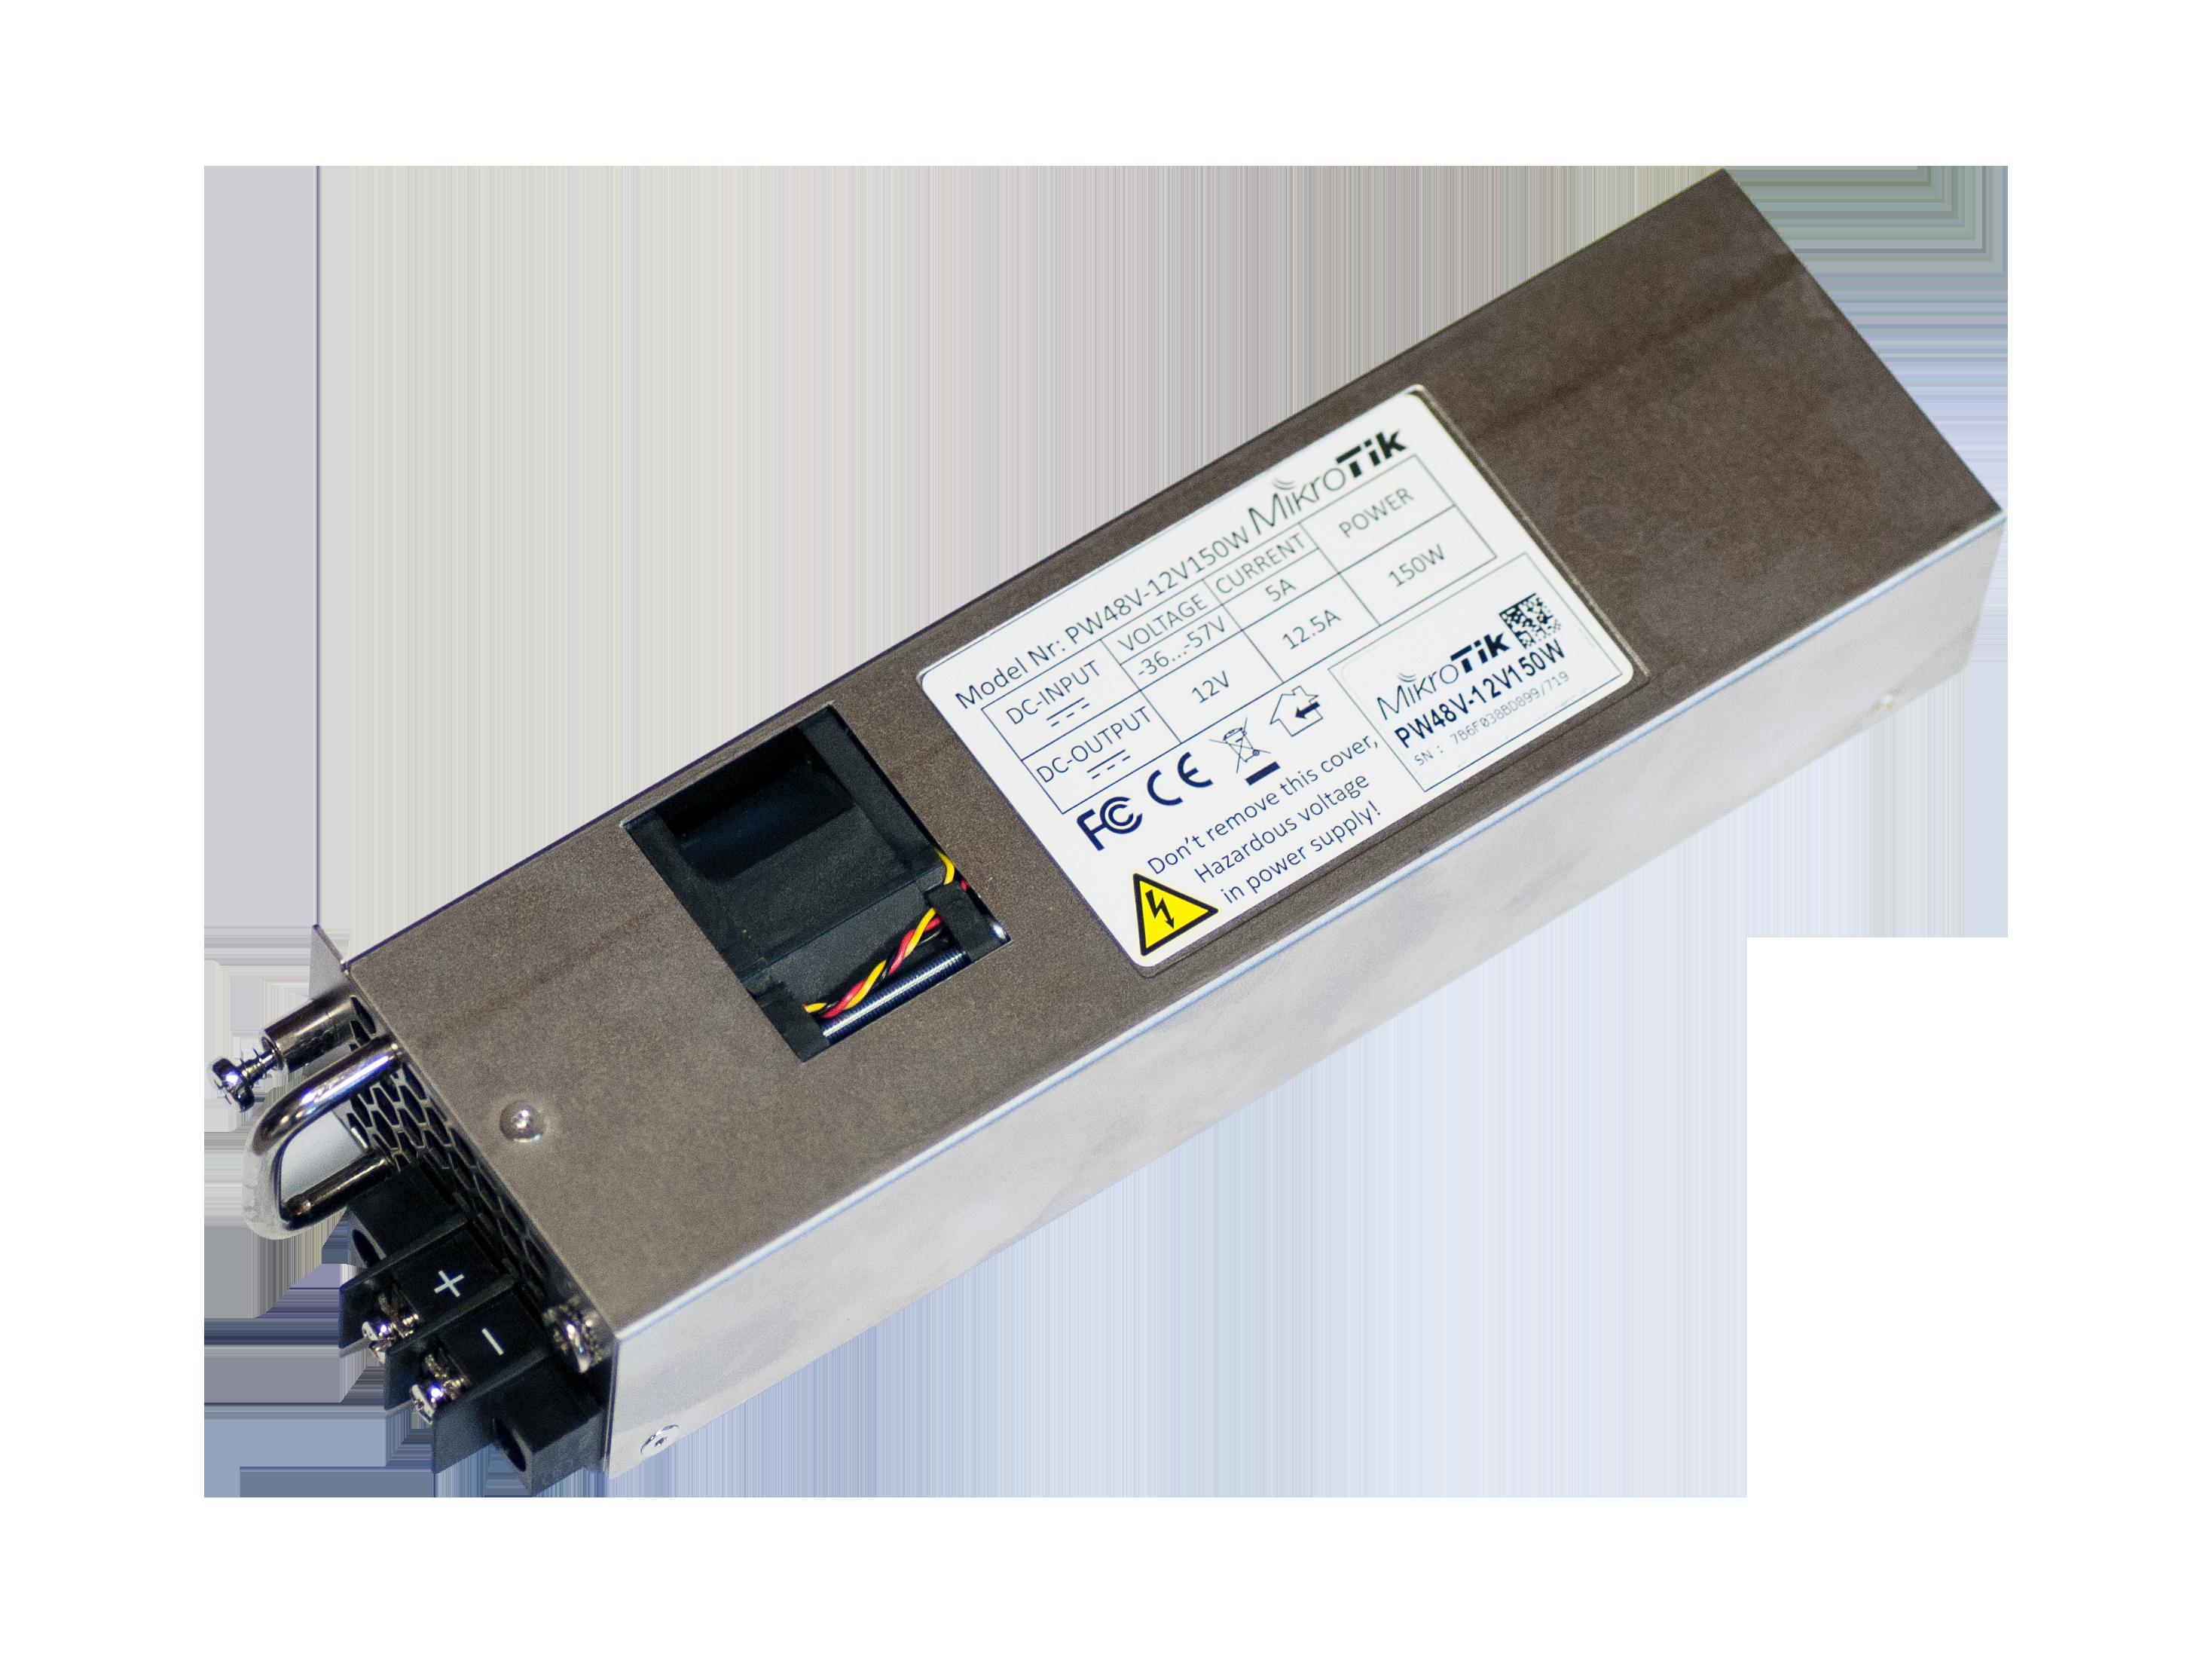 Woobm-USB – Tikdis